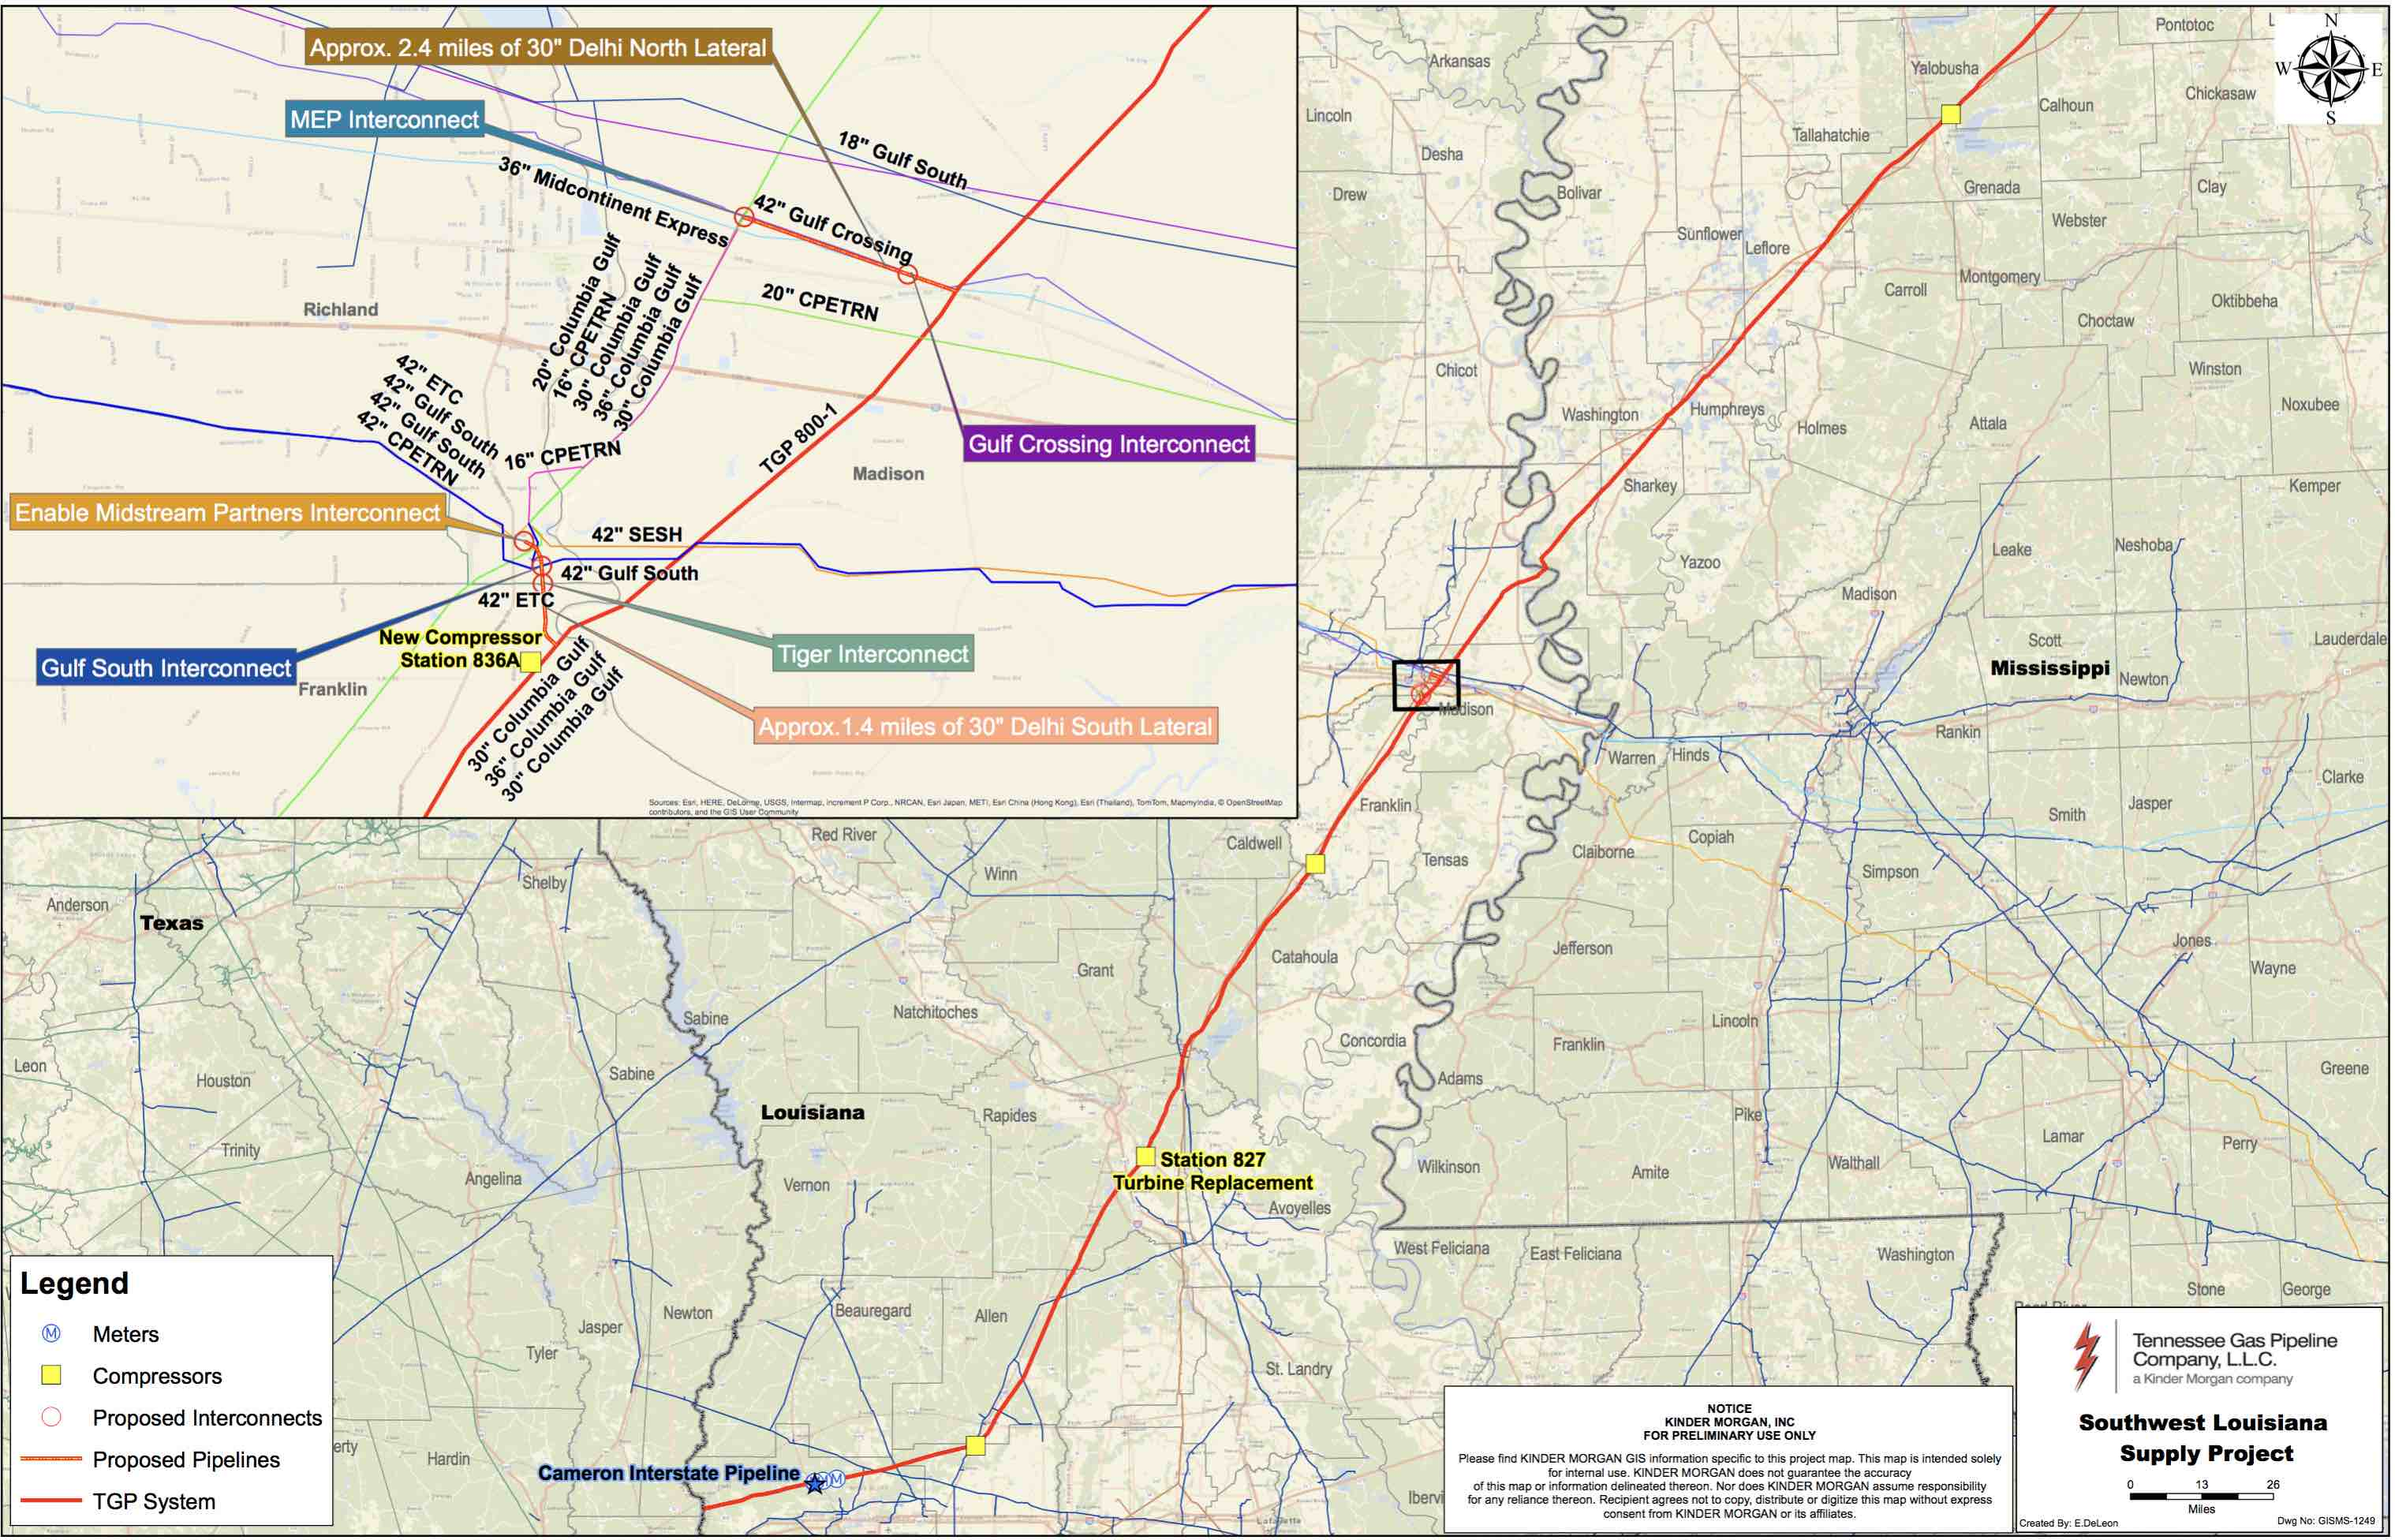 Southwest Louisiana Supply Project